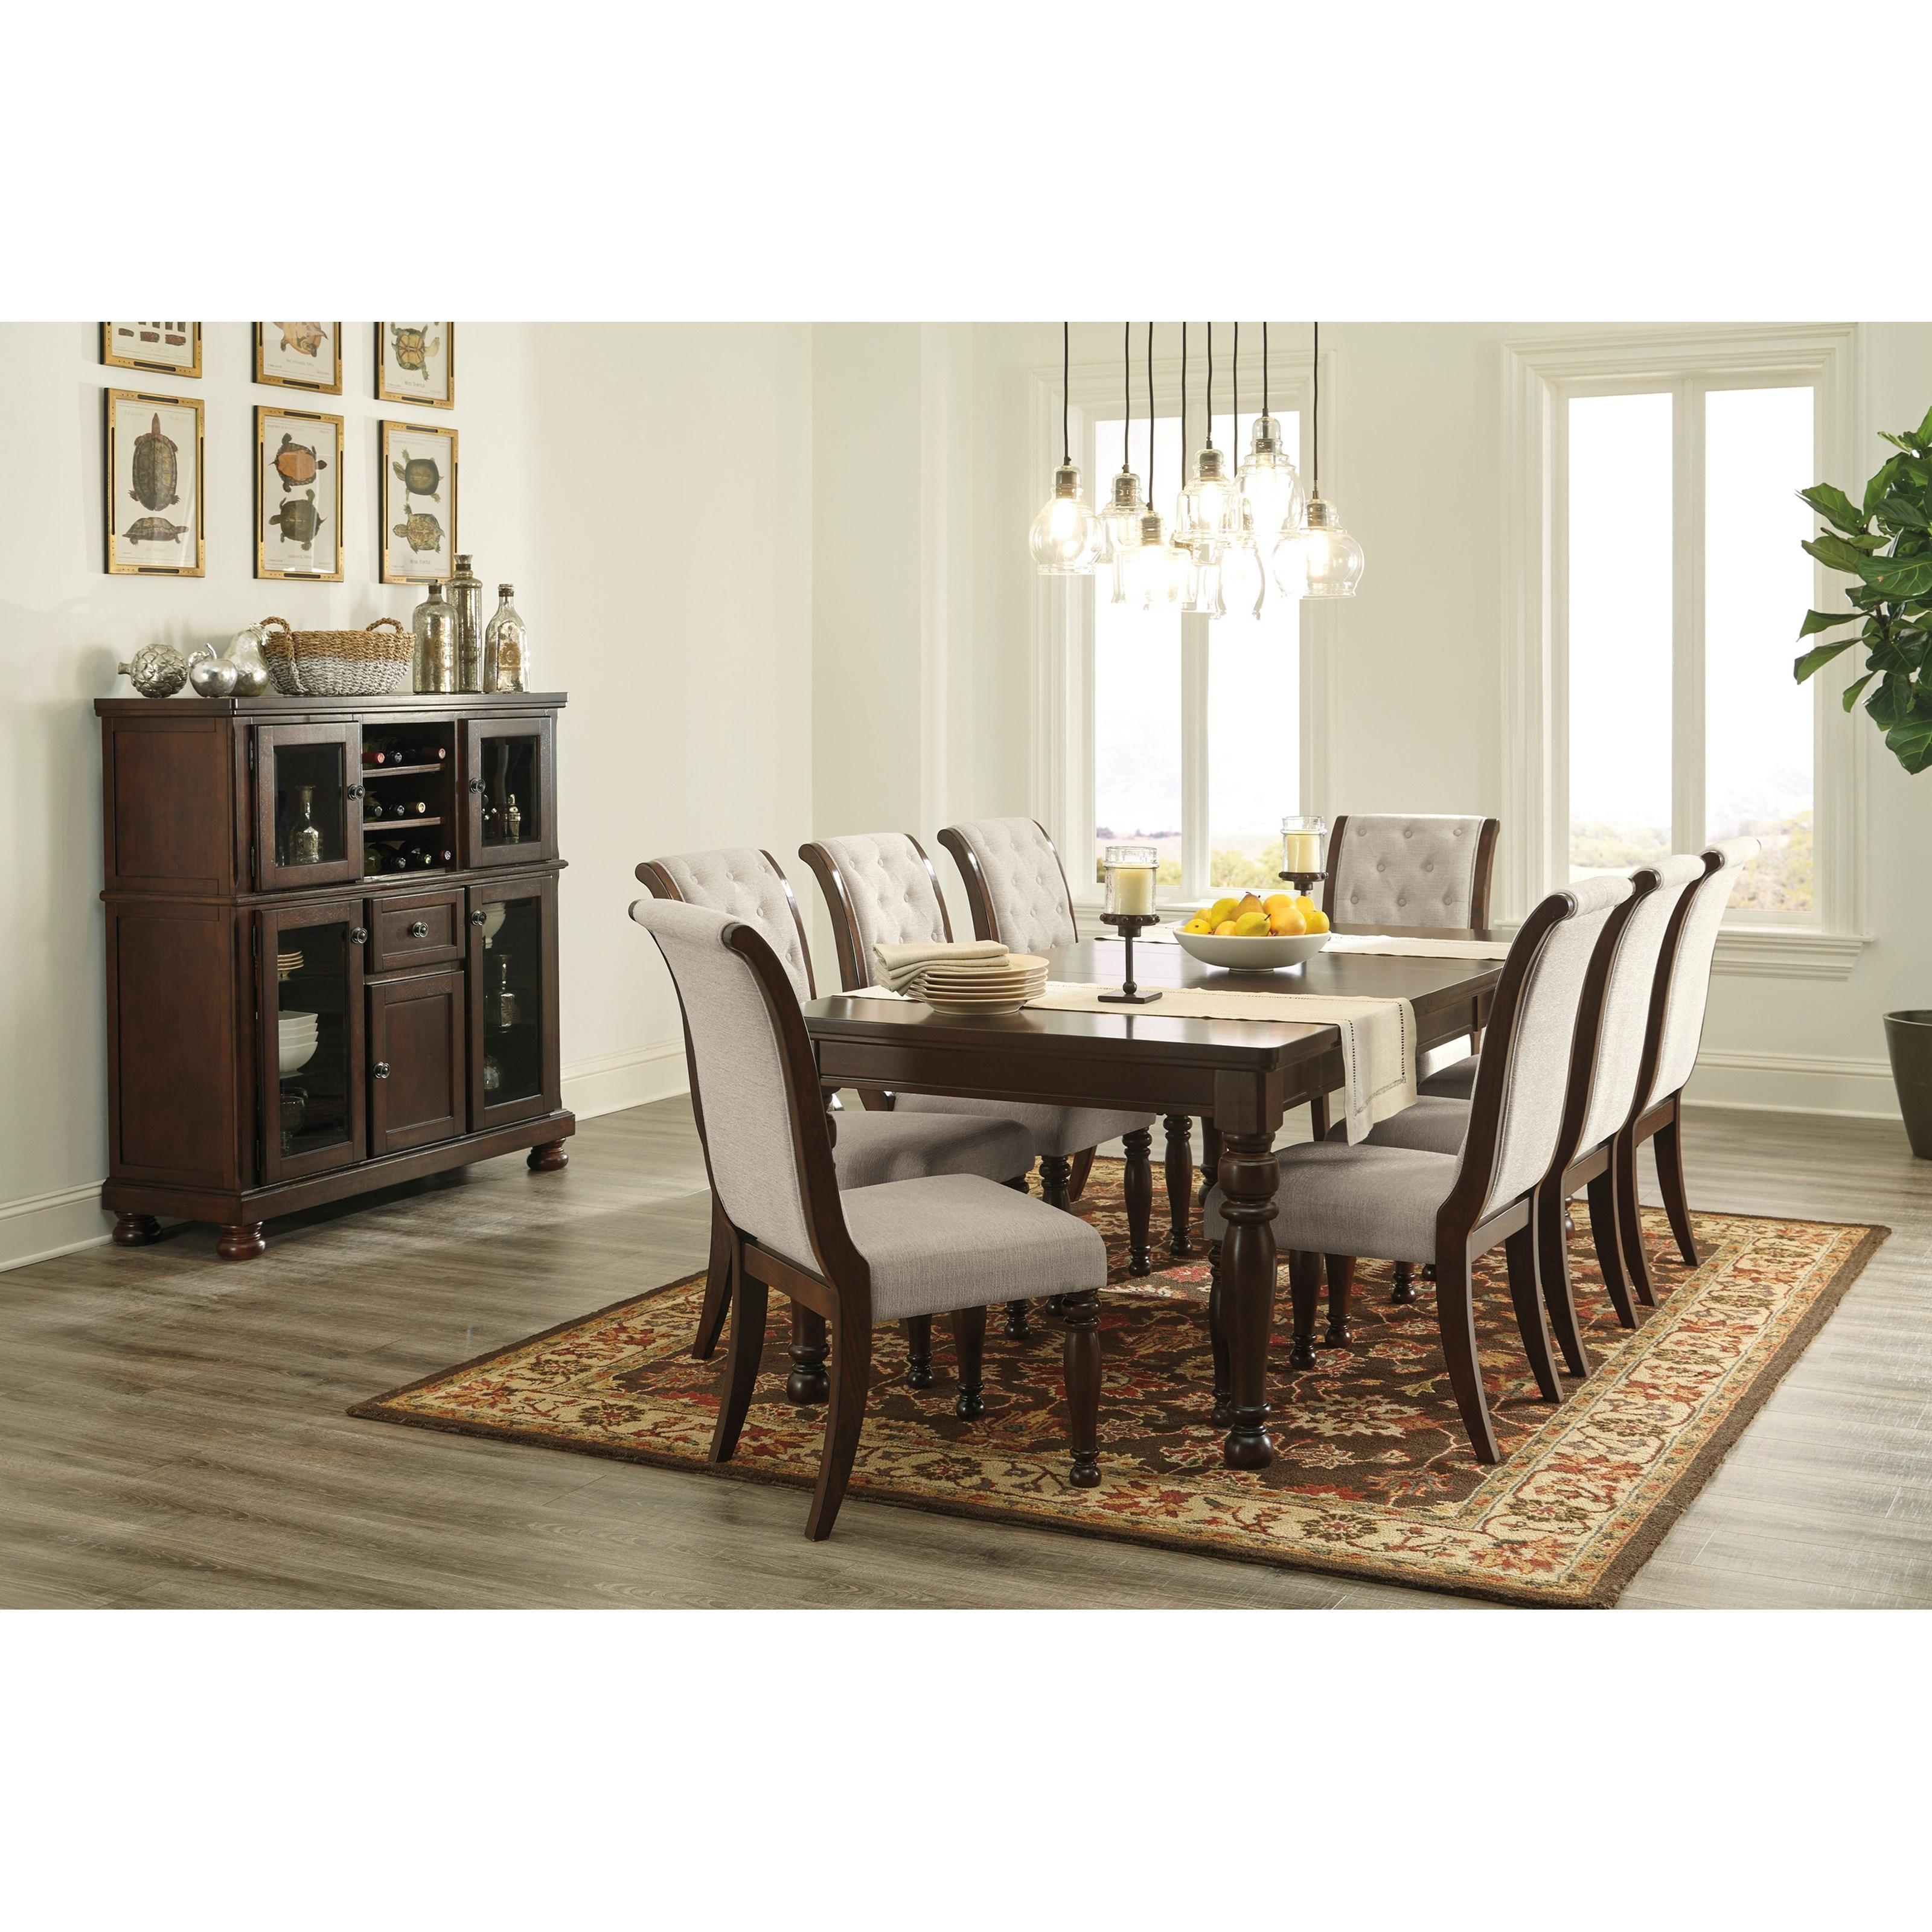 Ashley furniture formal dining